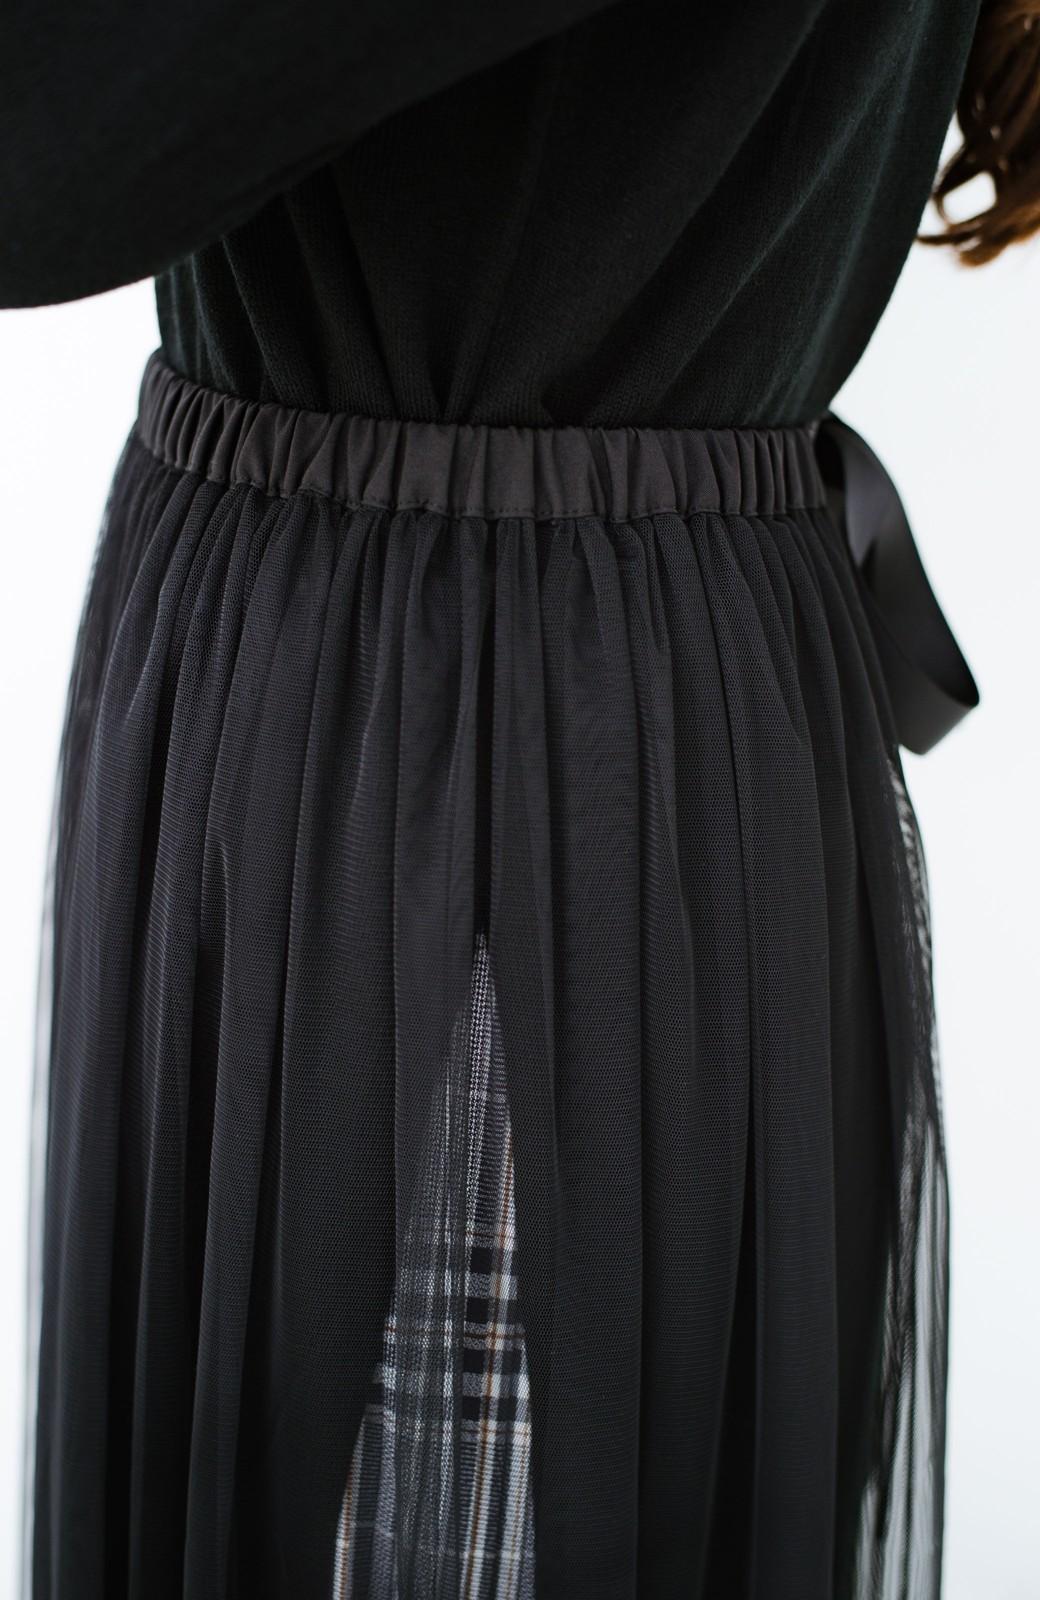 haco! 着こなし無限!自由自在なスリットロングニットとチェックプリーツスカートとチュール巻きスカートの3点セット <ブラック>の商品写真10